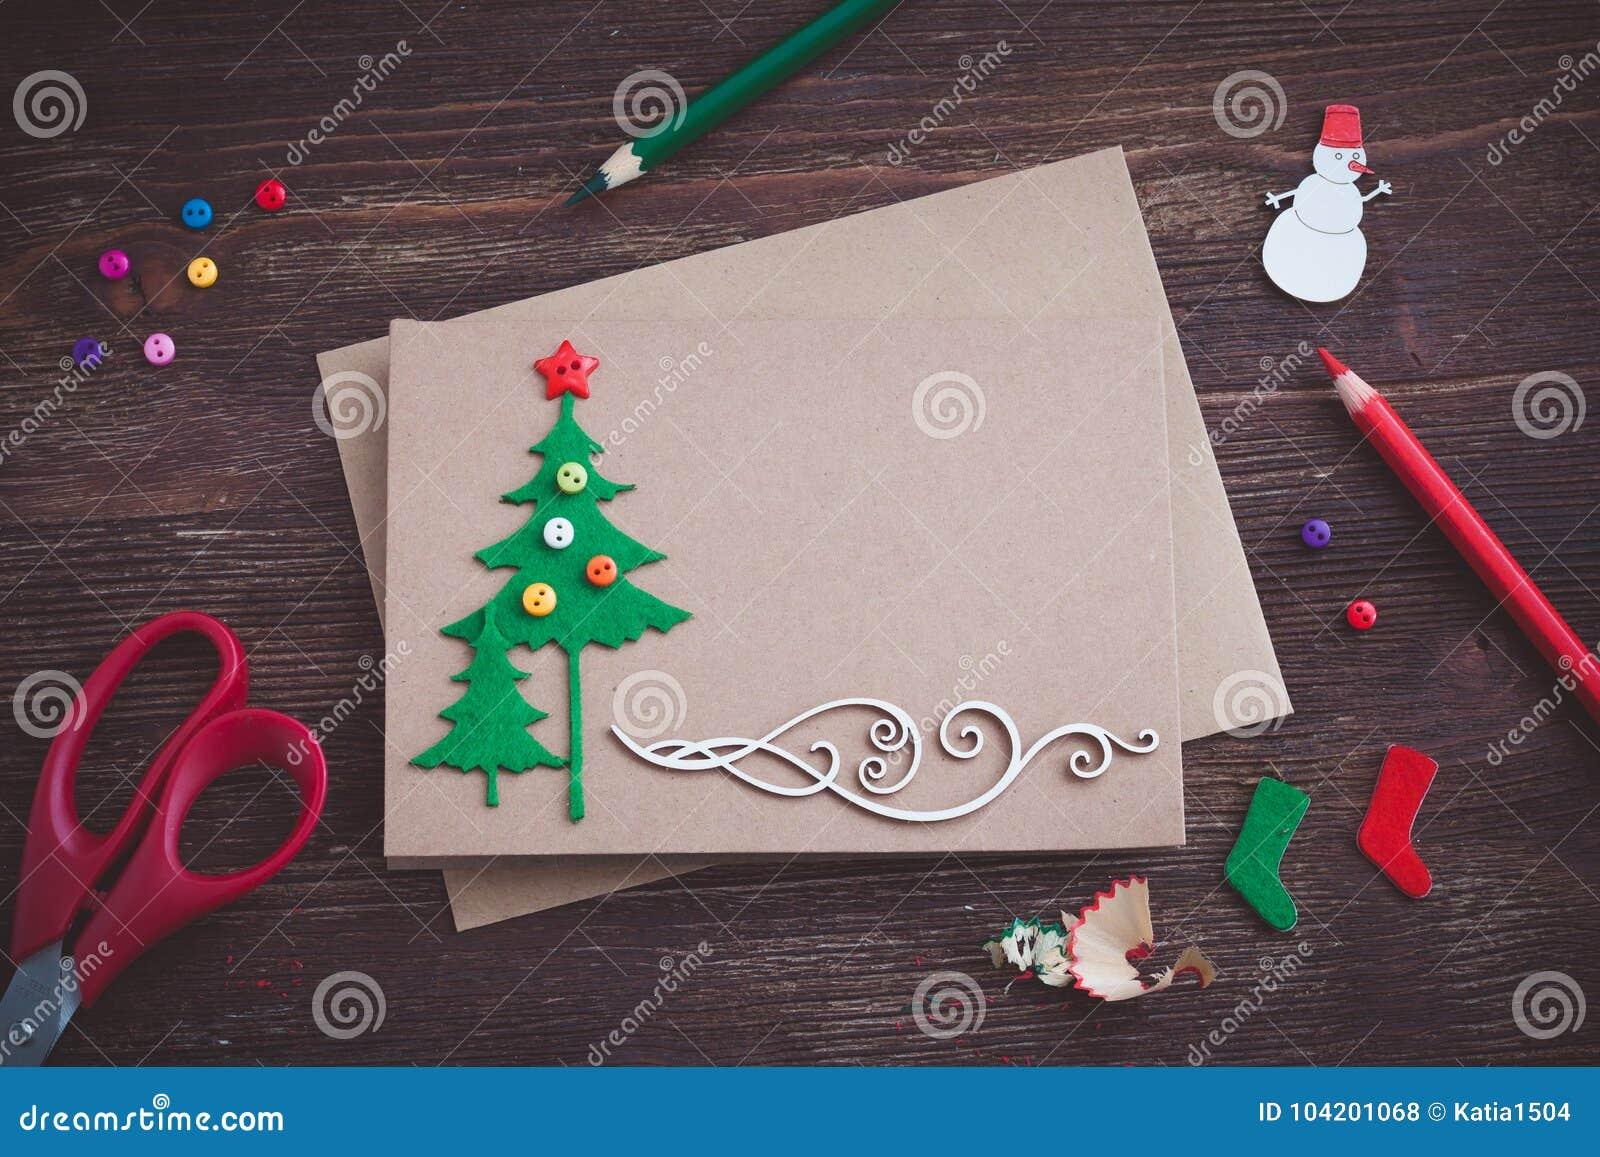 Signing Handmade Christmas Card With Felt Christmas Tree Snowflakes